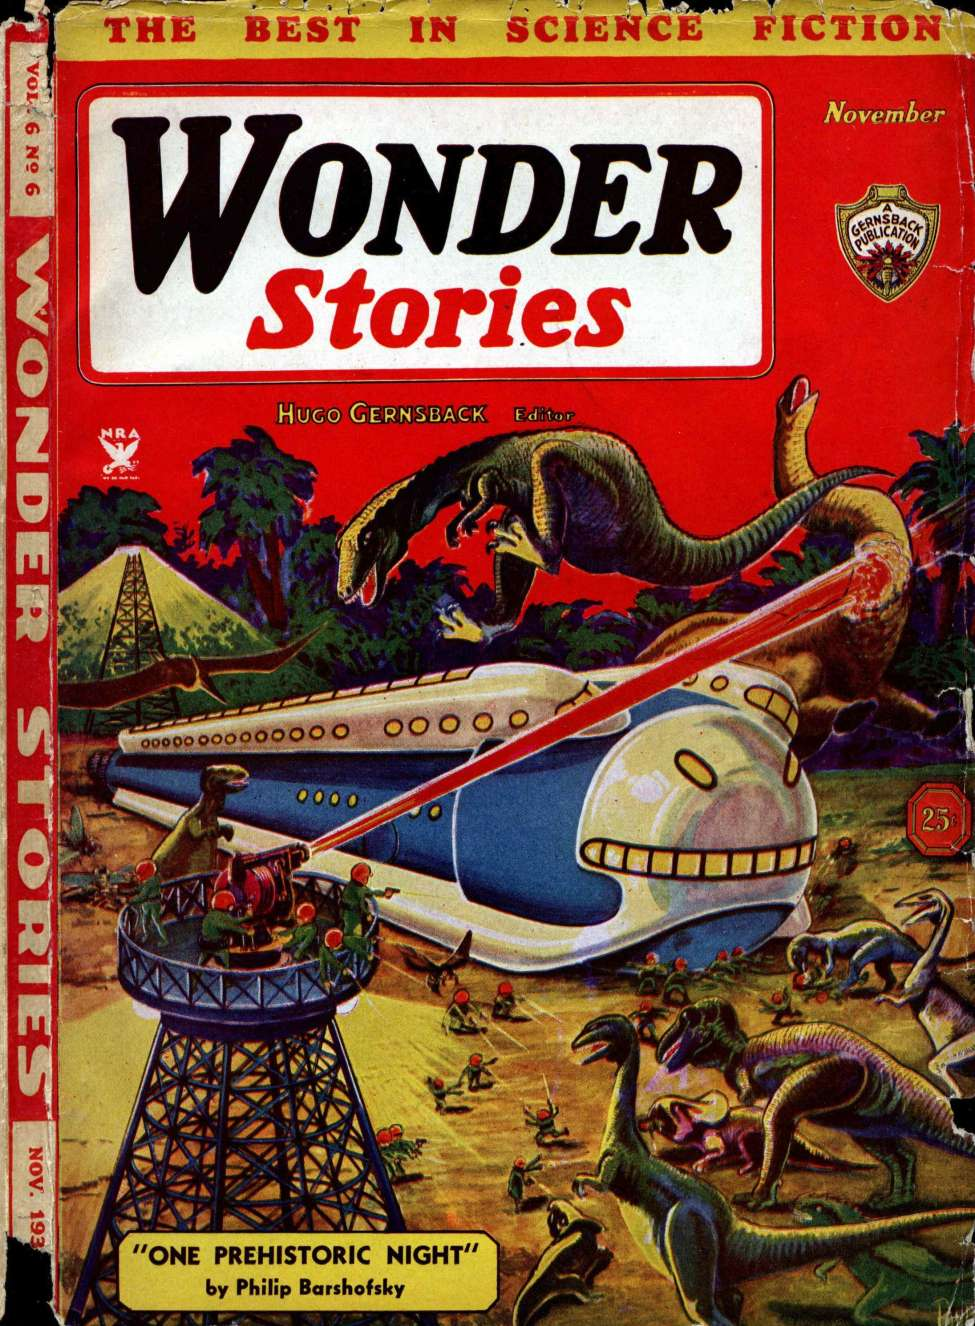 Comic Book Cover For Wonder Stories v6 06 - Dawn to Dusk - Eando Binder